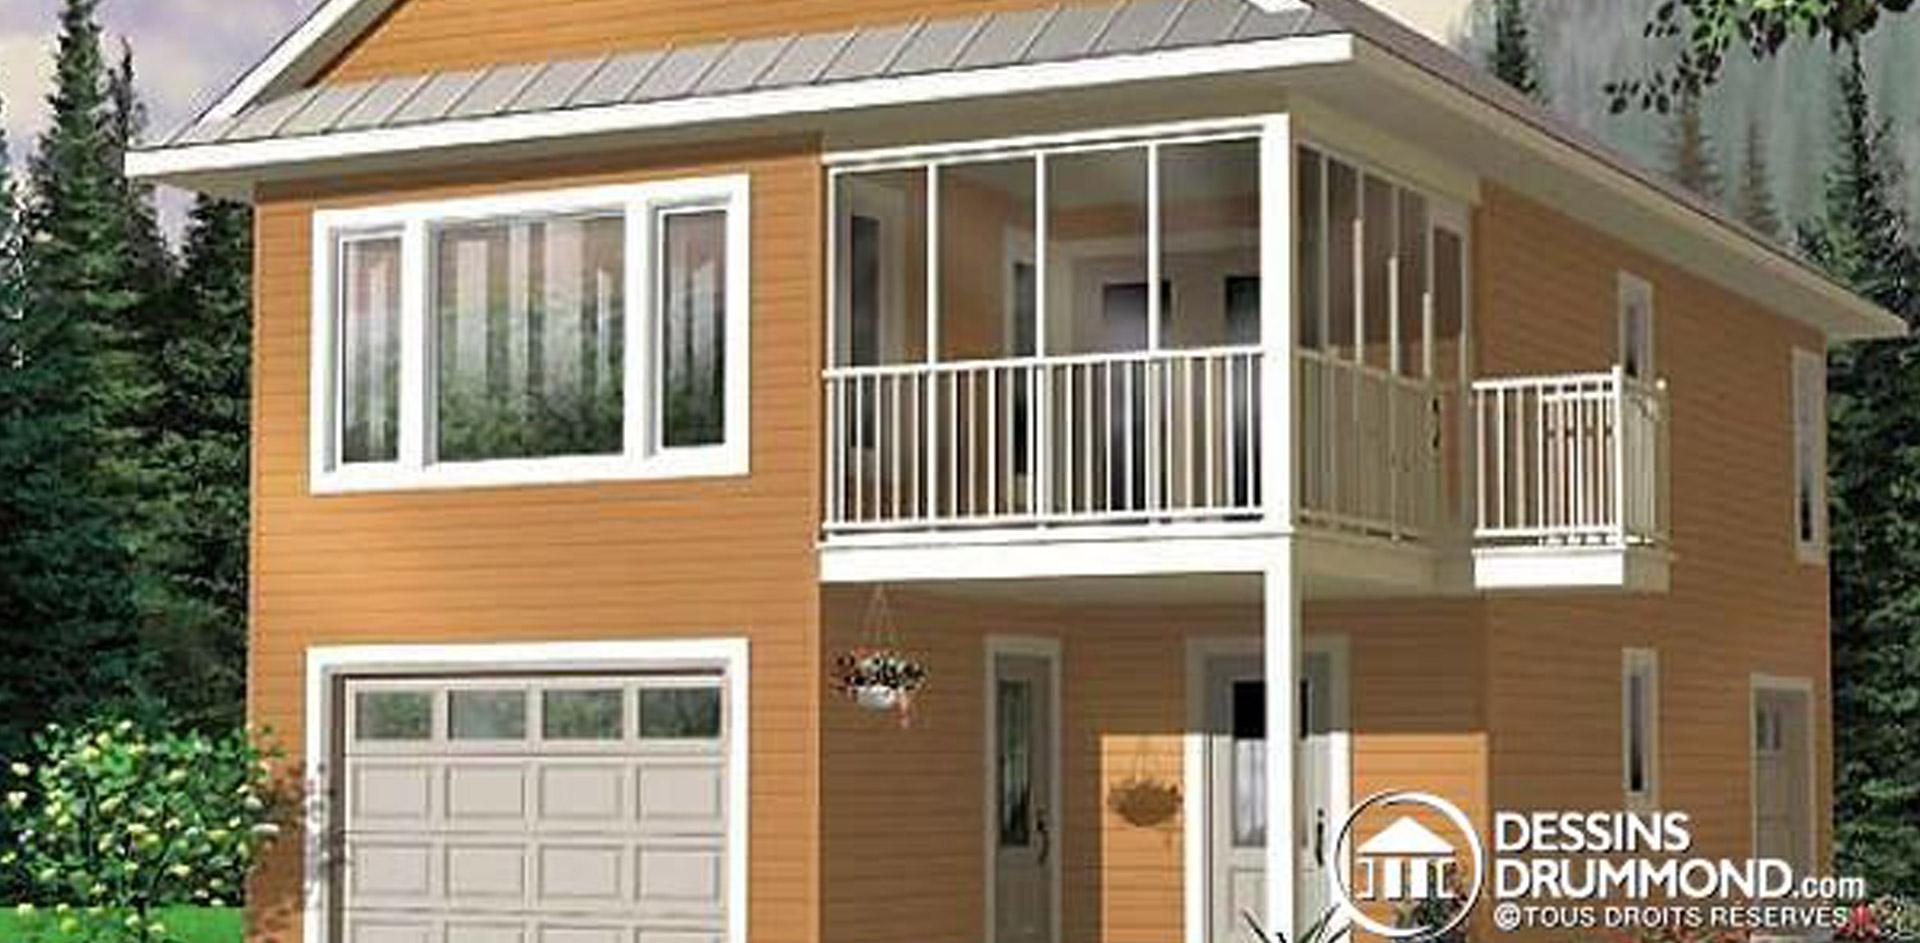 1080 sq.ft. timber mart garage apartment